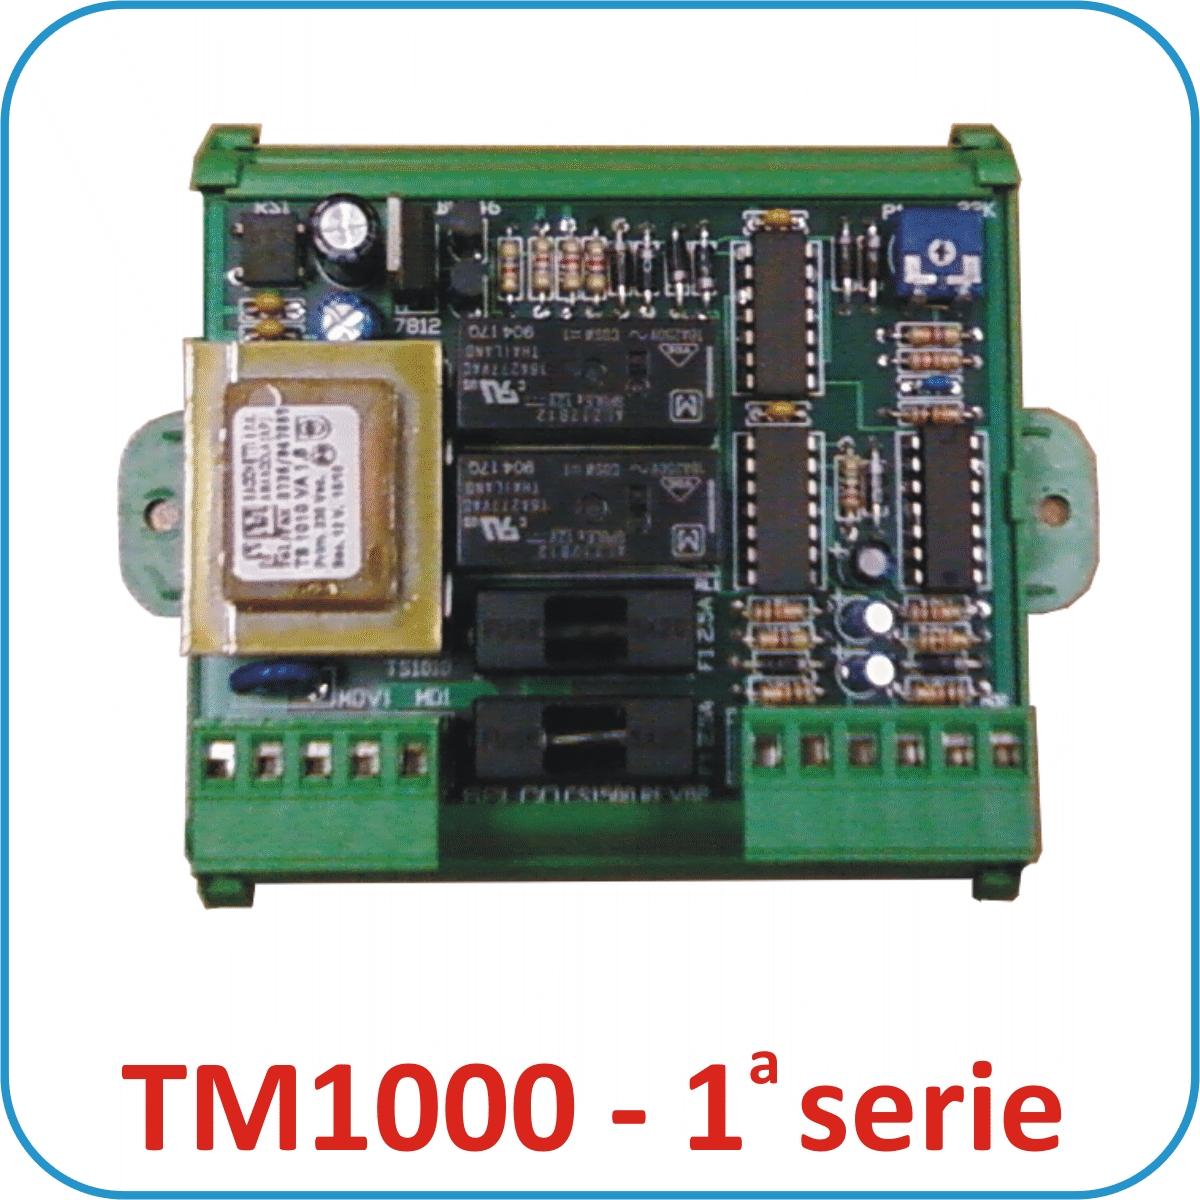 TM1000 1 SERIE